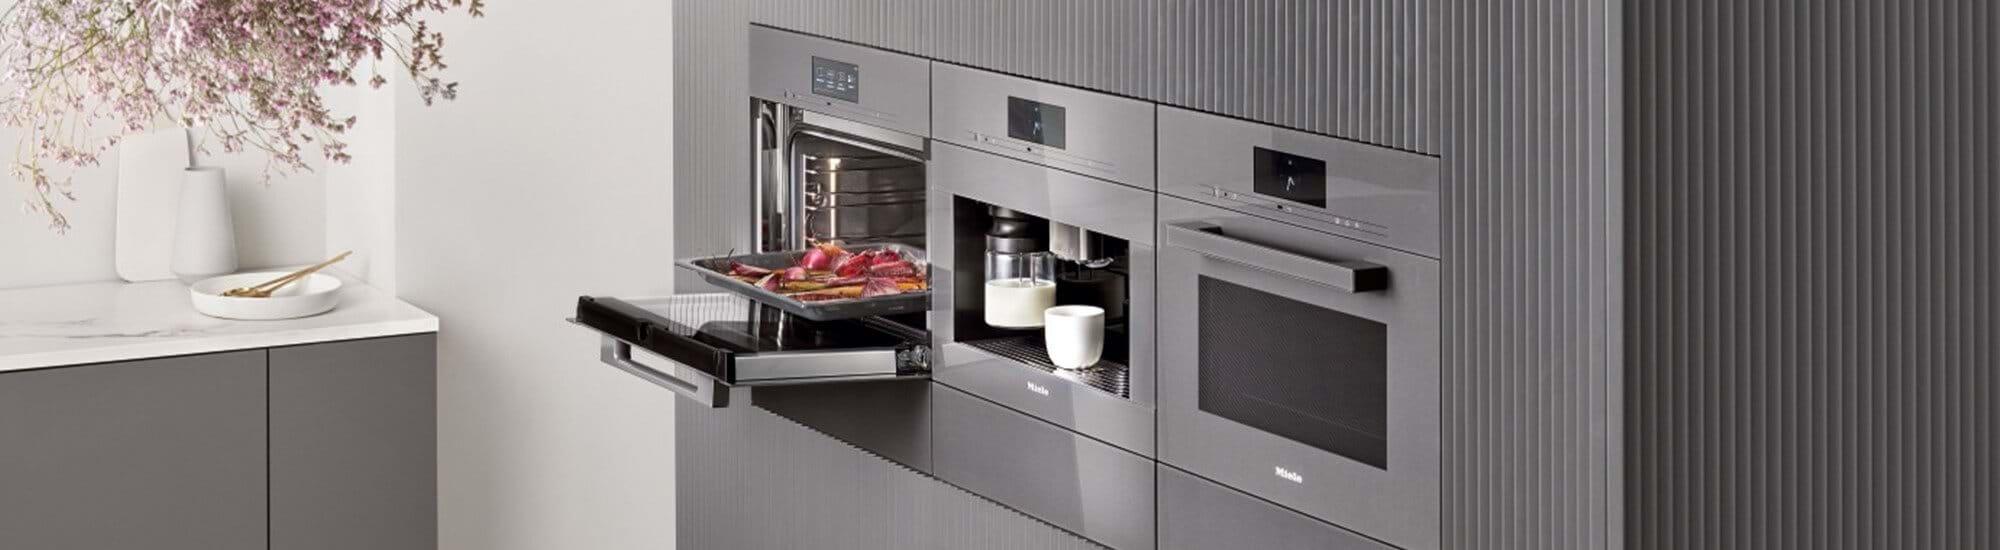 Miele built in appliances